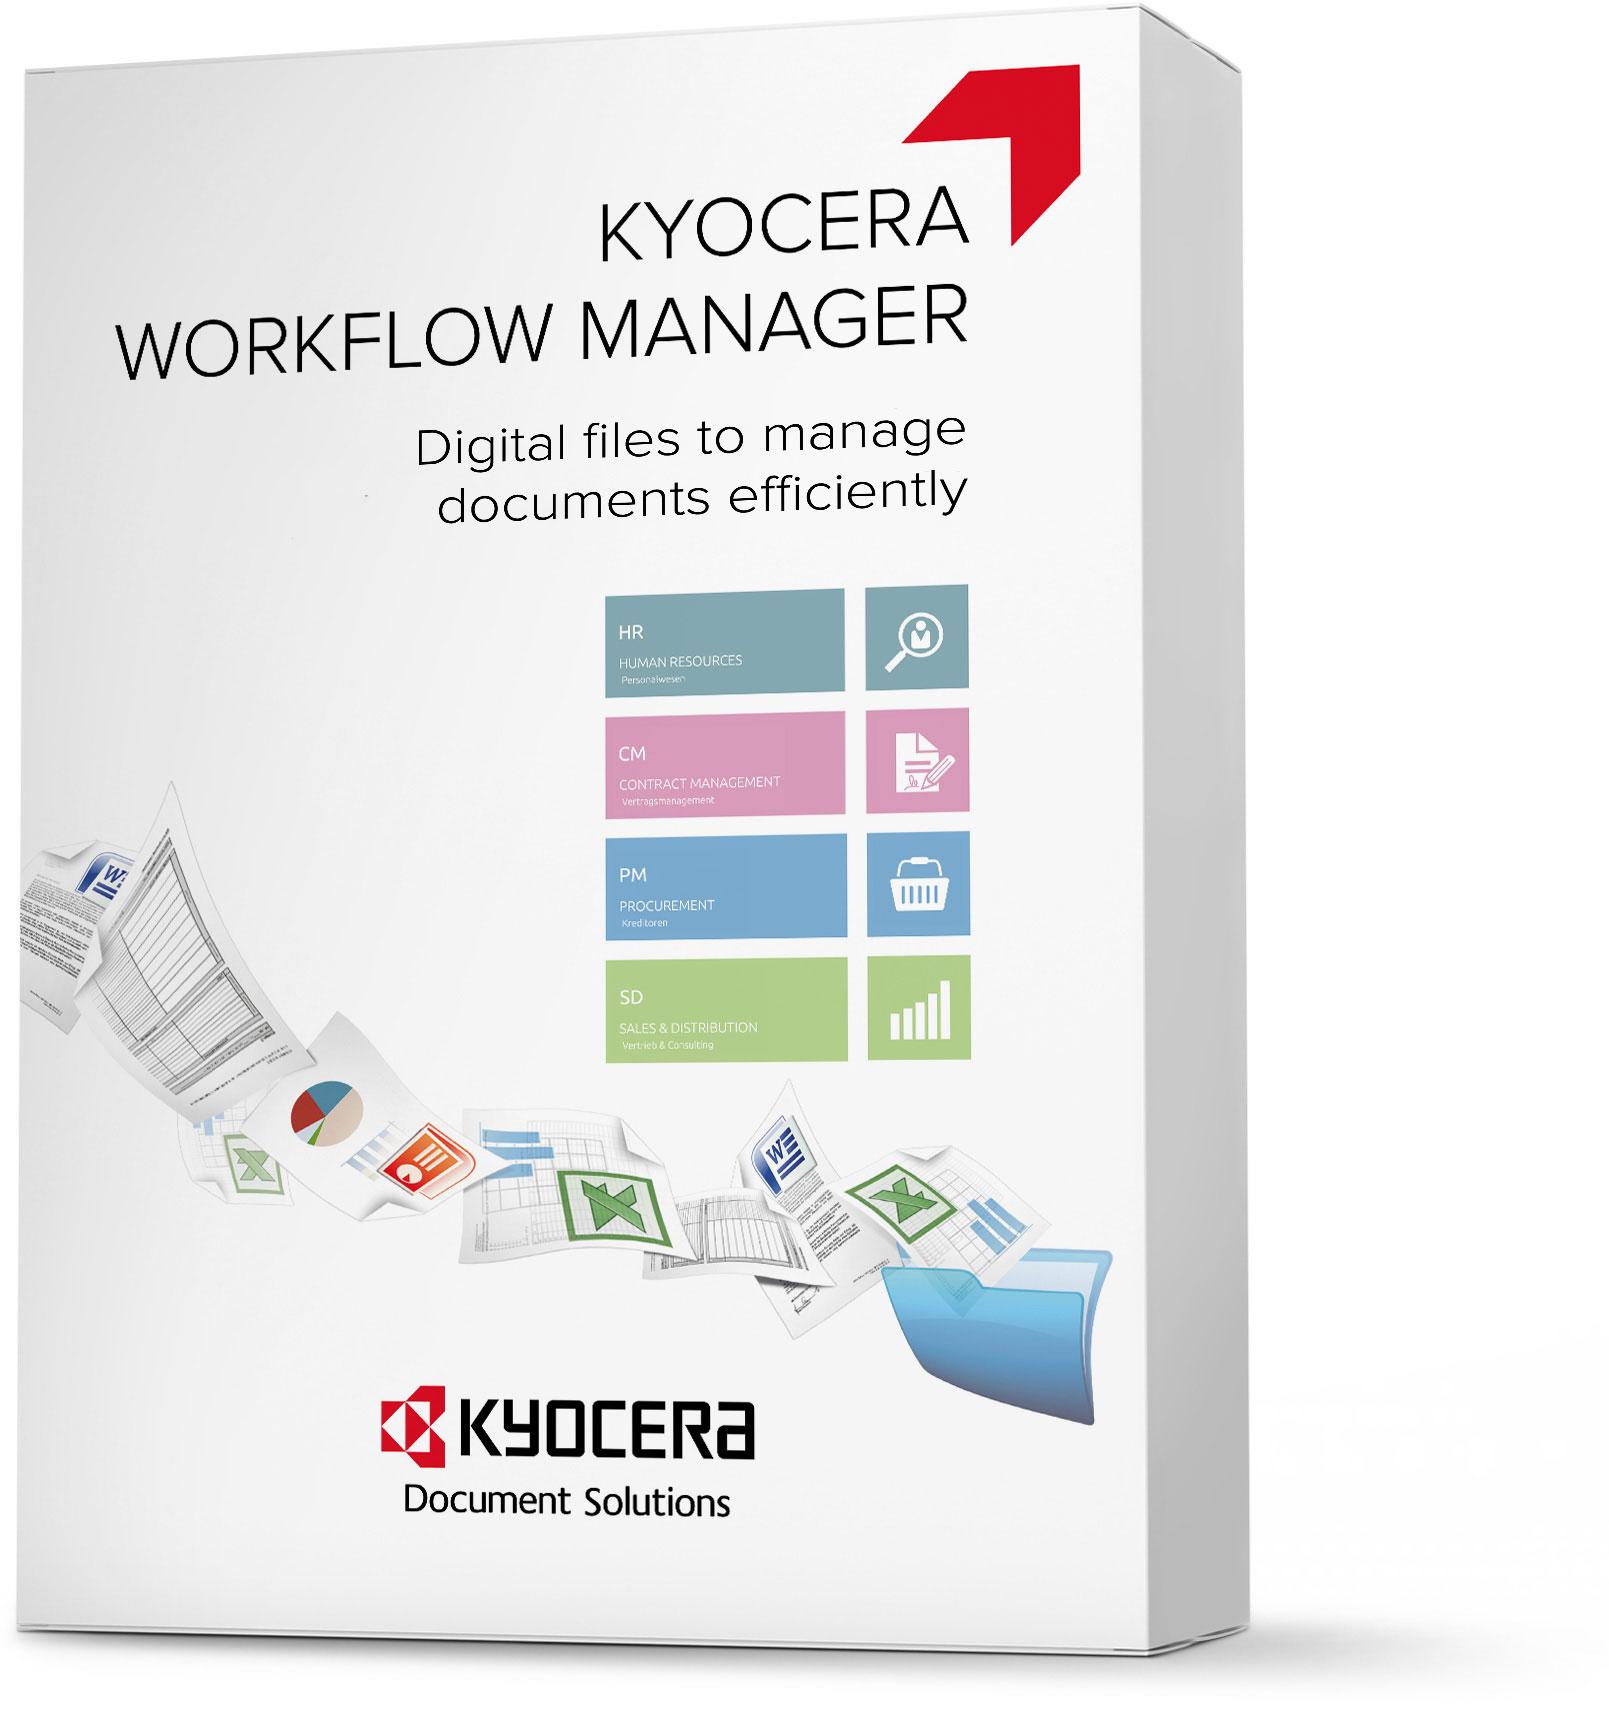 KYOCERA   Workflow Manager